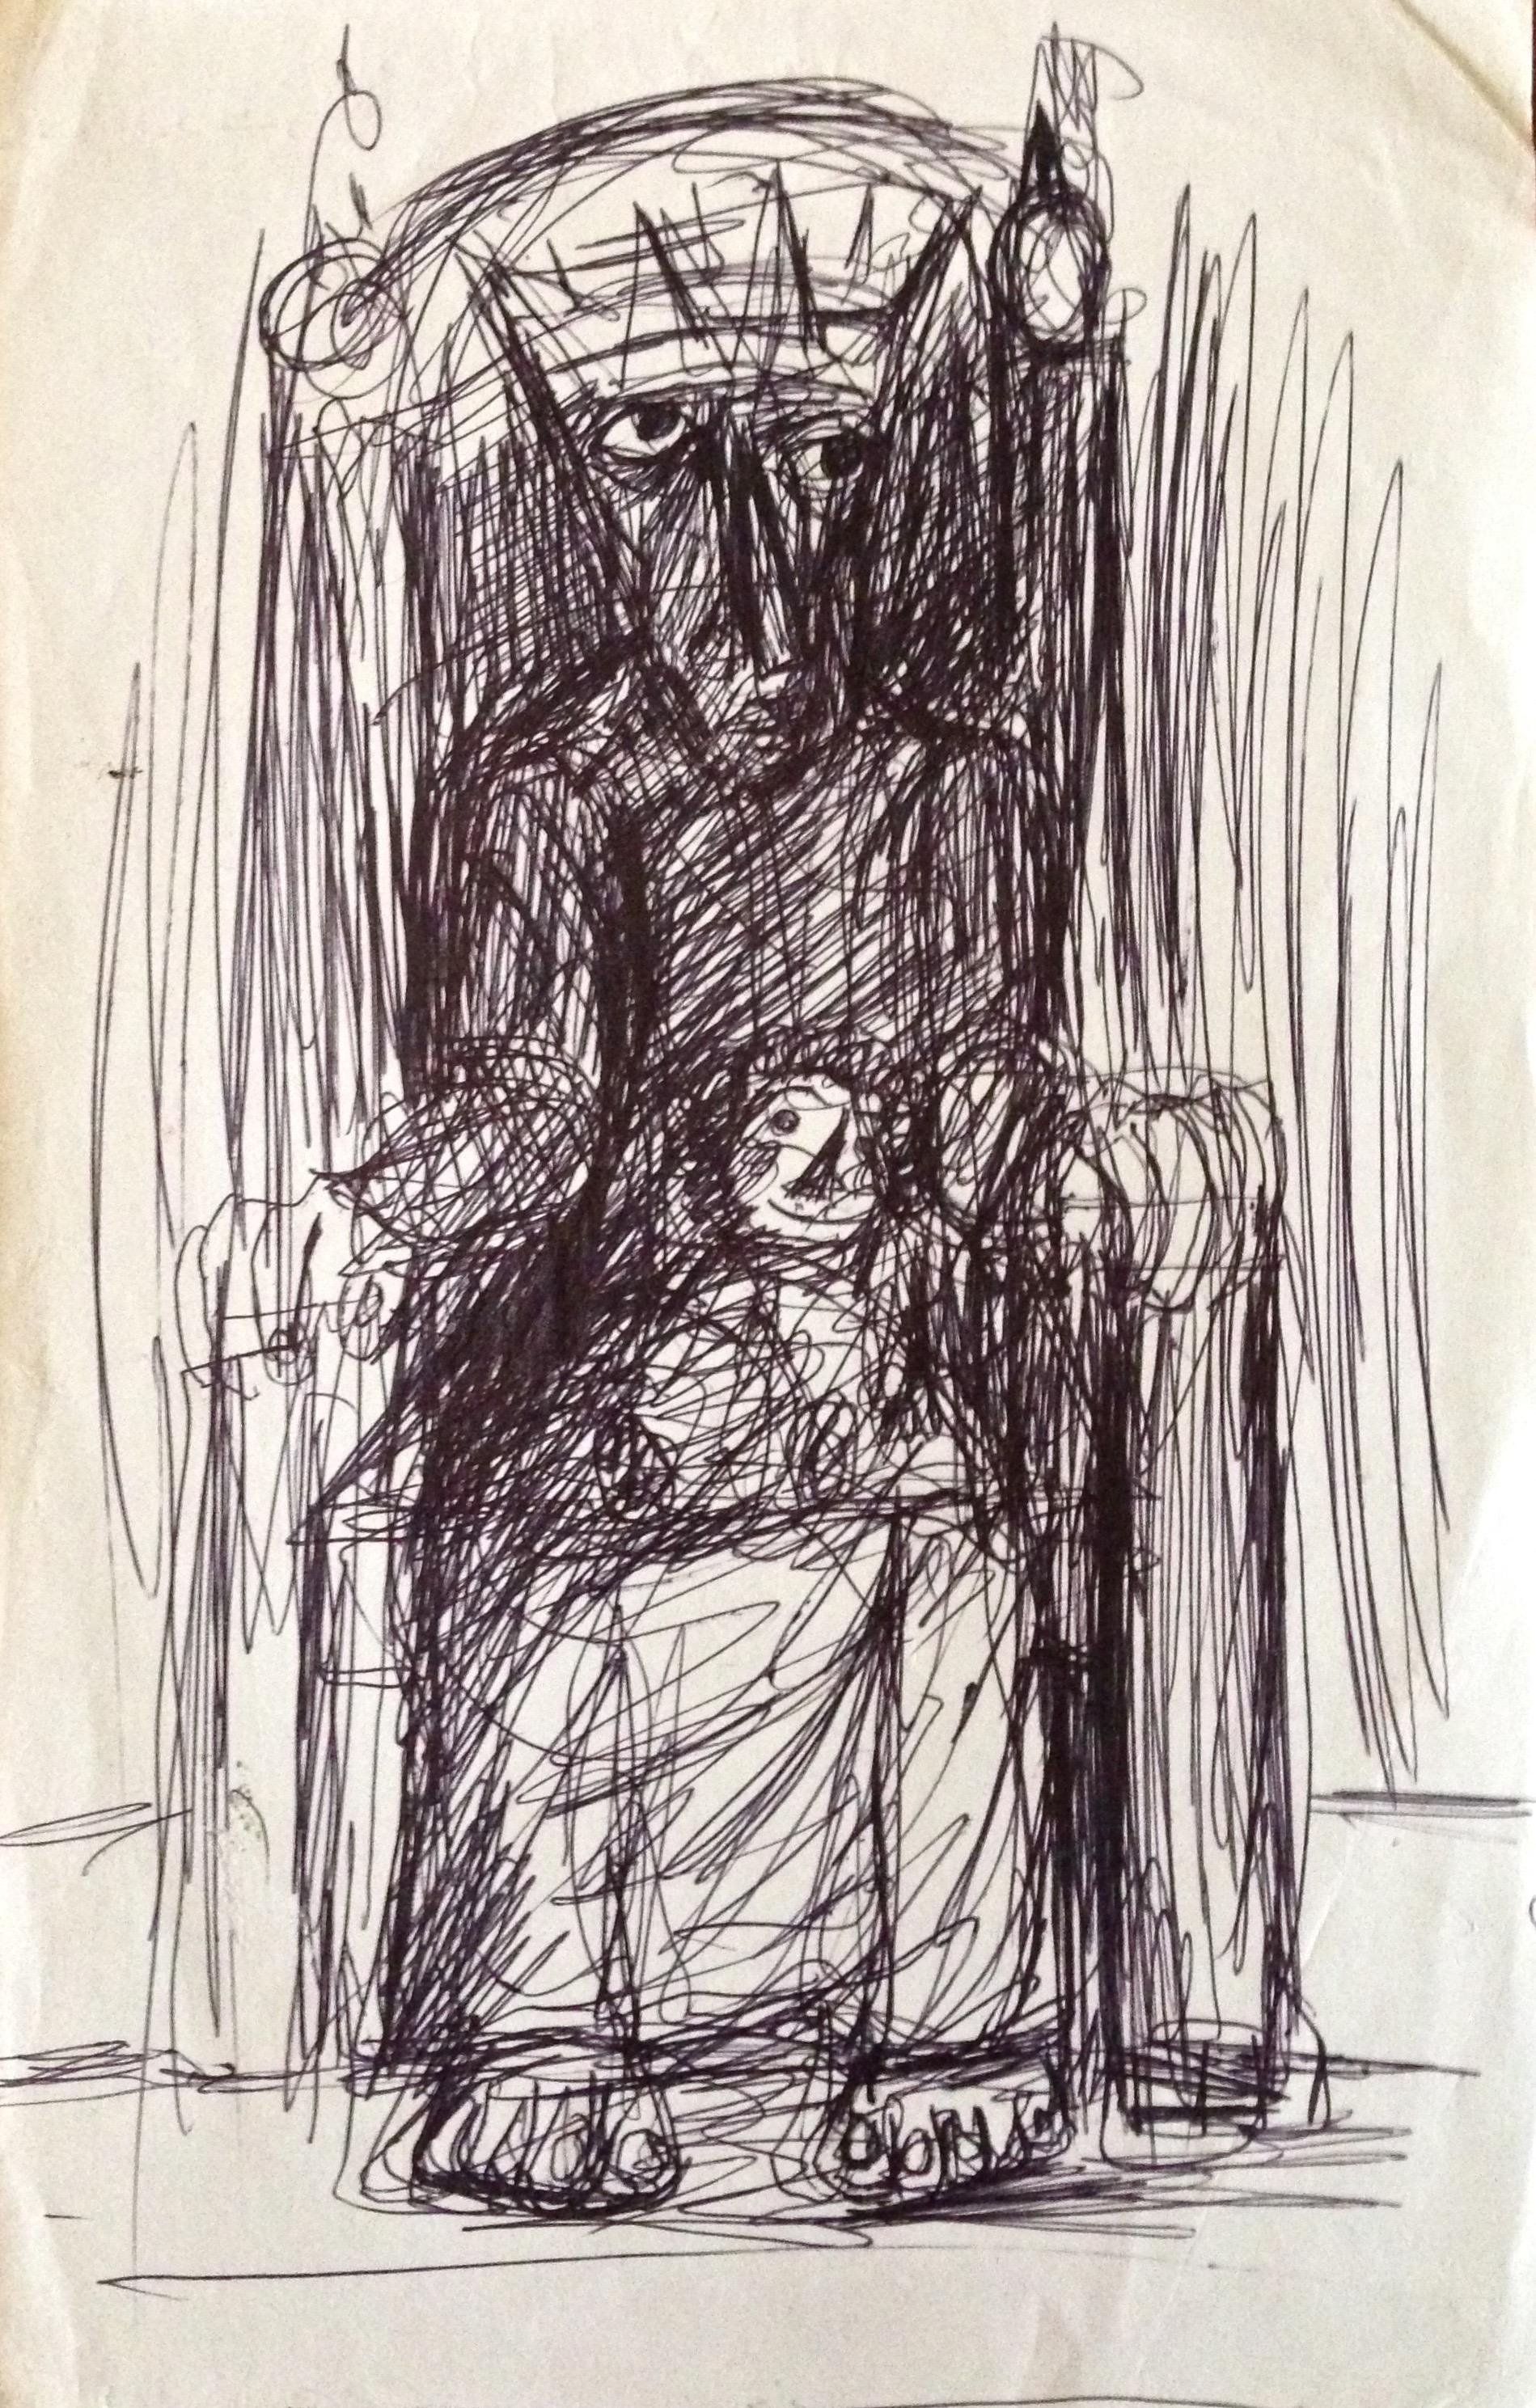 Ahmed Morsi, Untitled, Pen on paper.